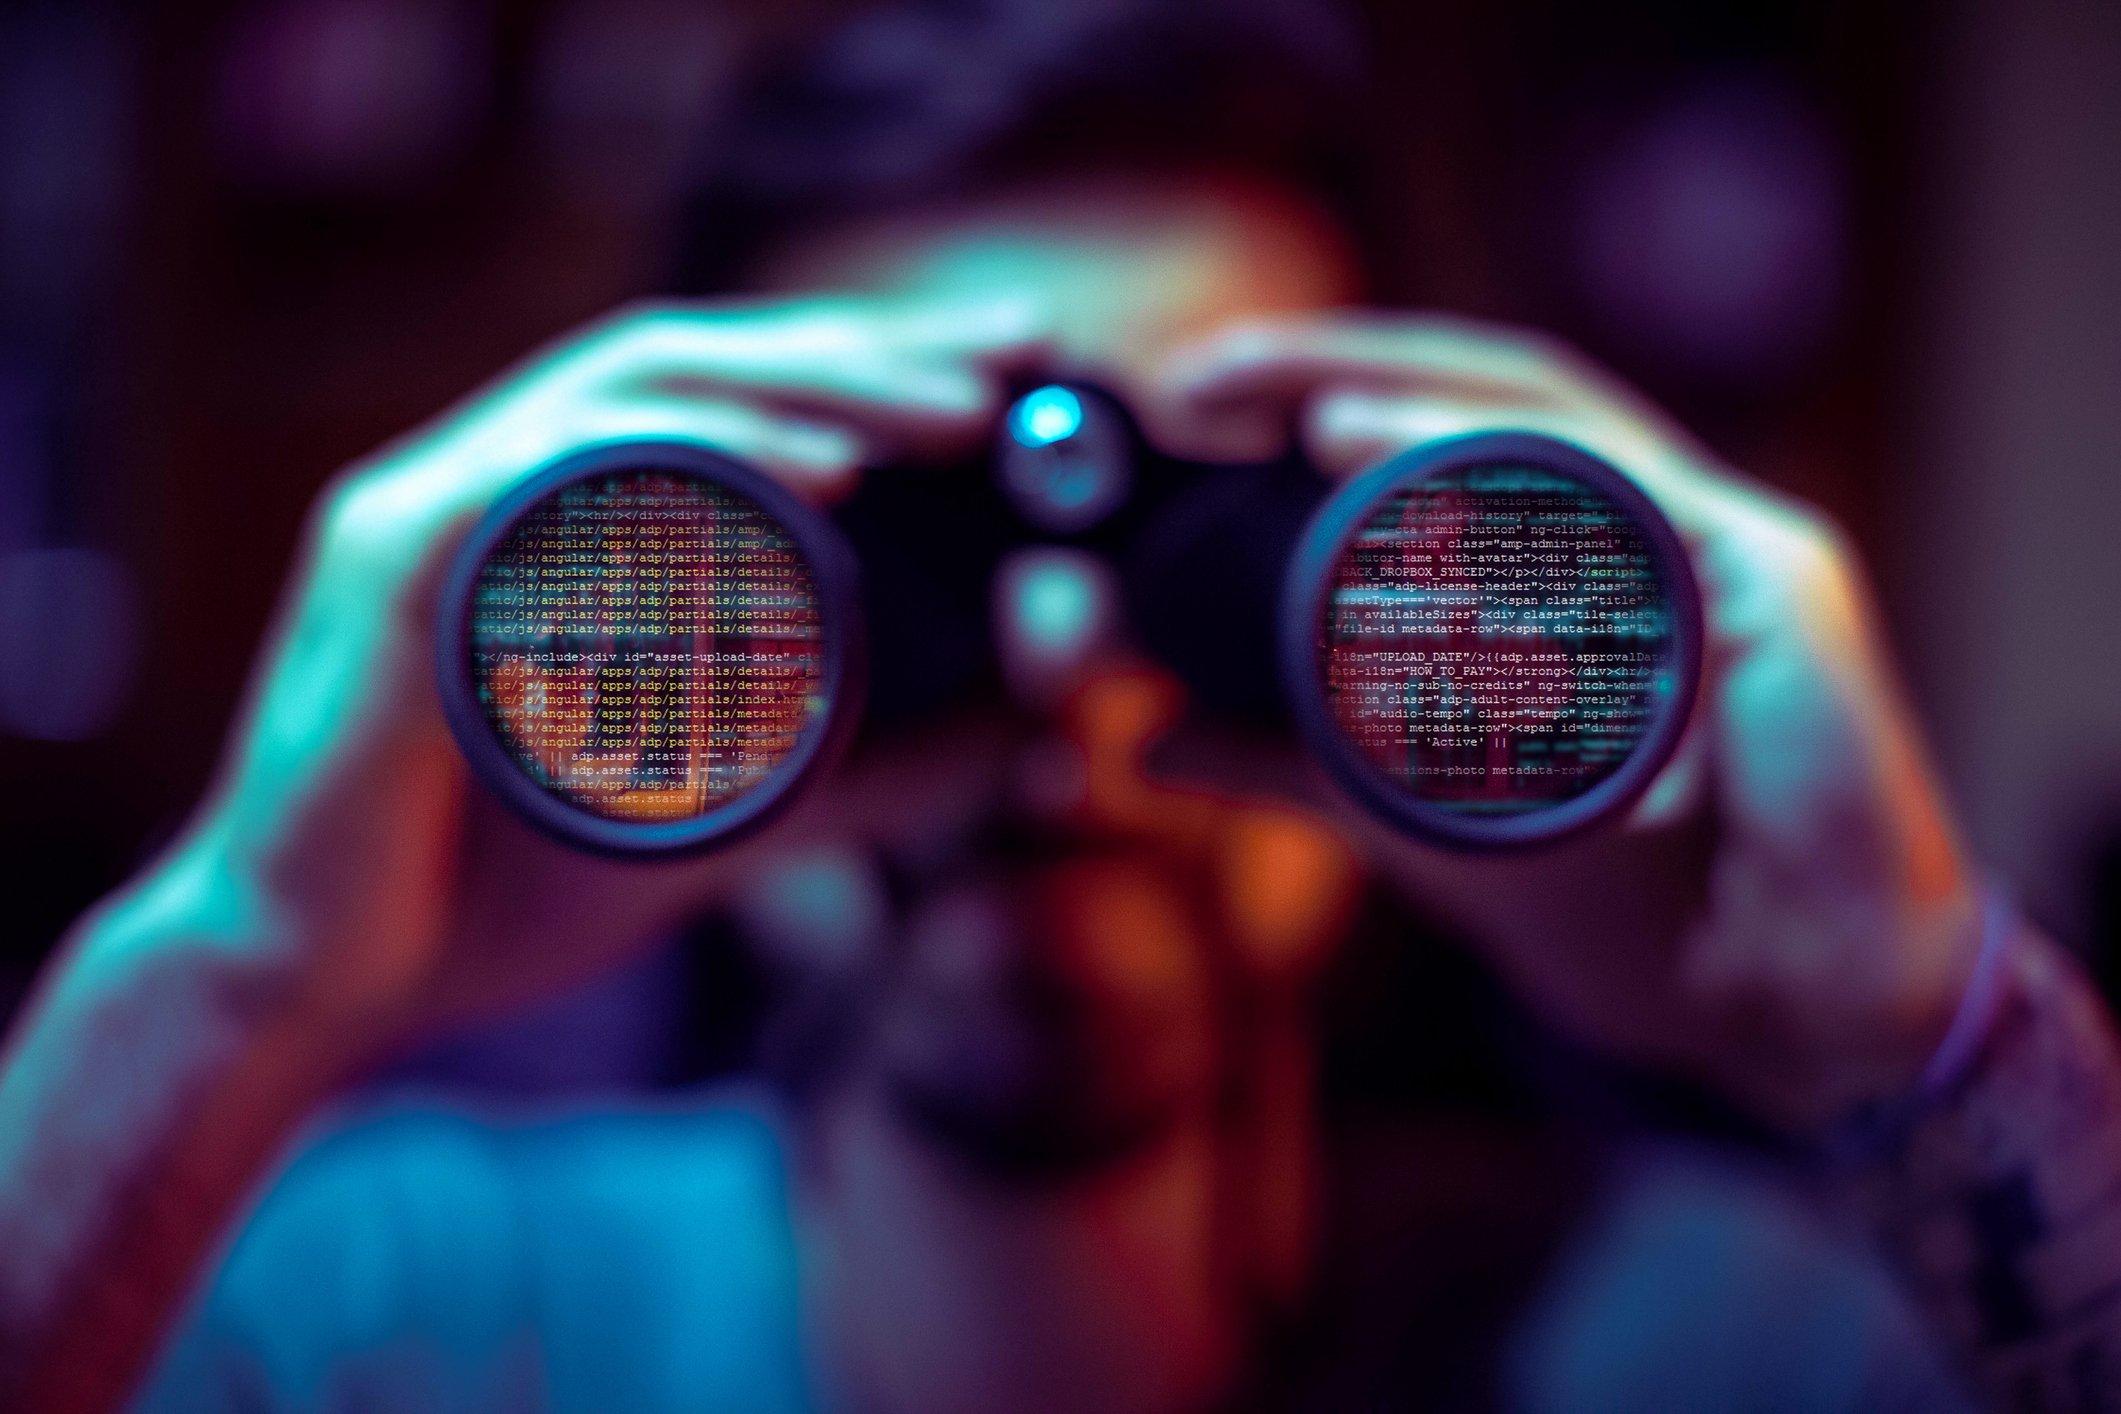 Специалисты: Преемник WannaCry вирус WannaMine тайно майнит криптовалюту